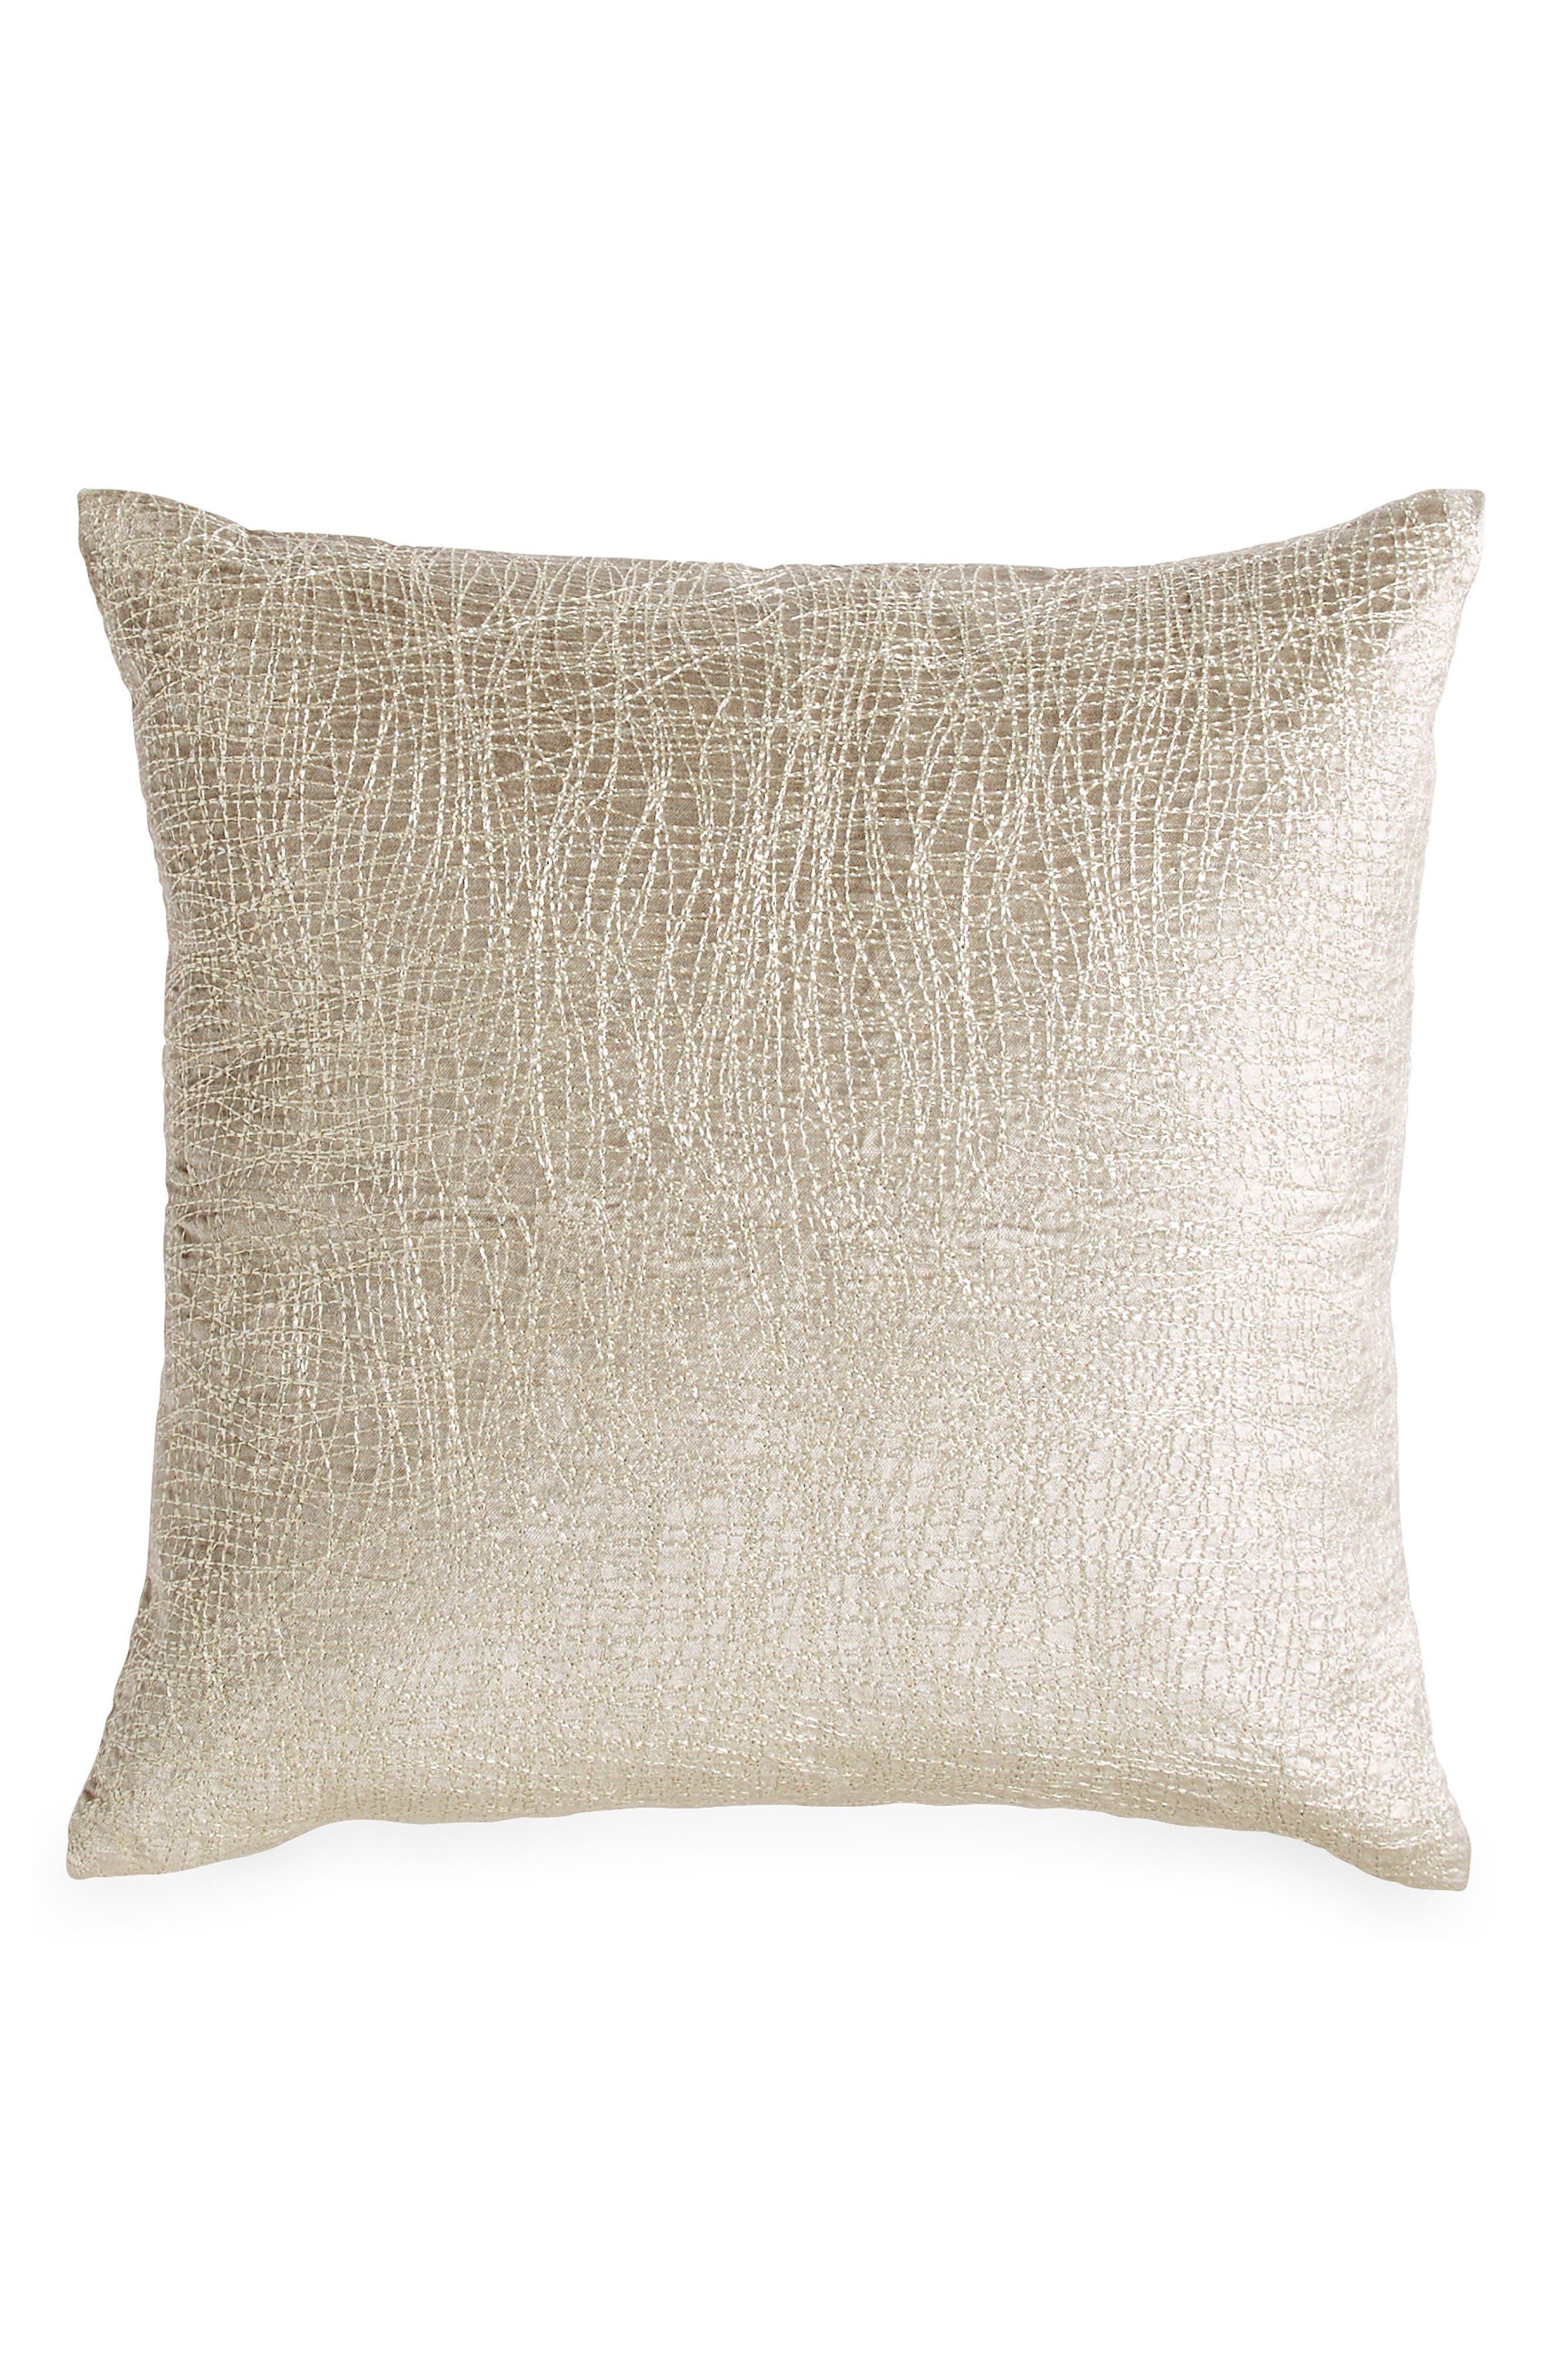 Alternate Image 1 Selected - Donna Karan New York Tidal Accent Pillow